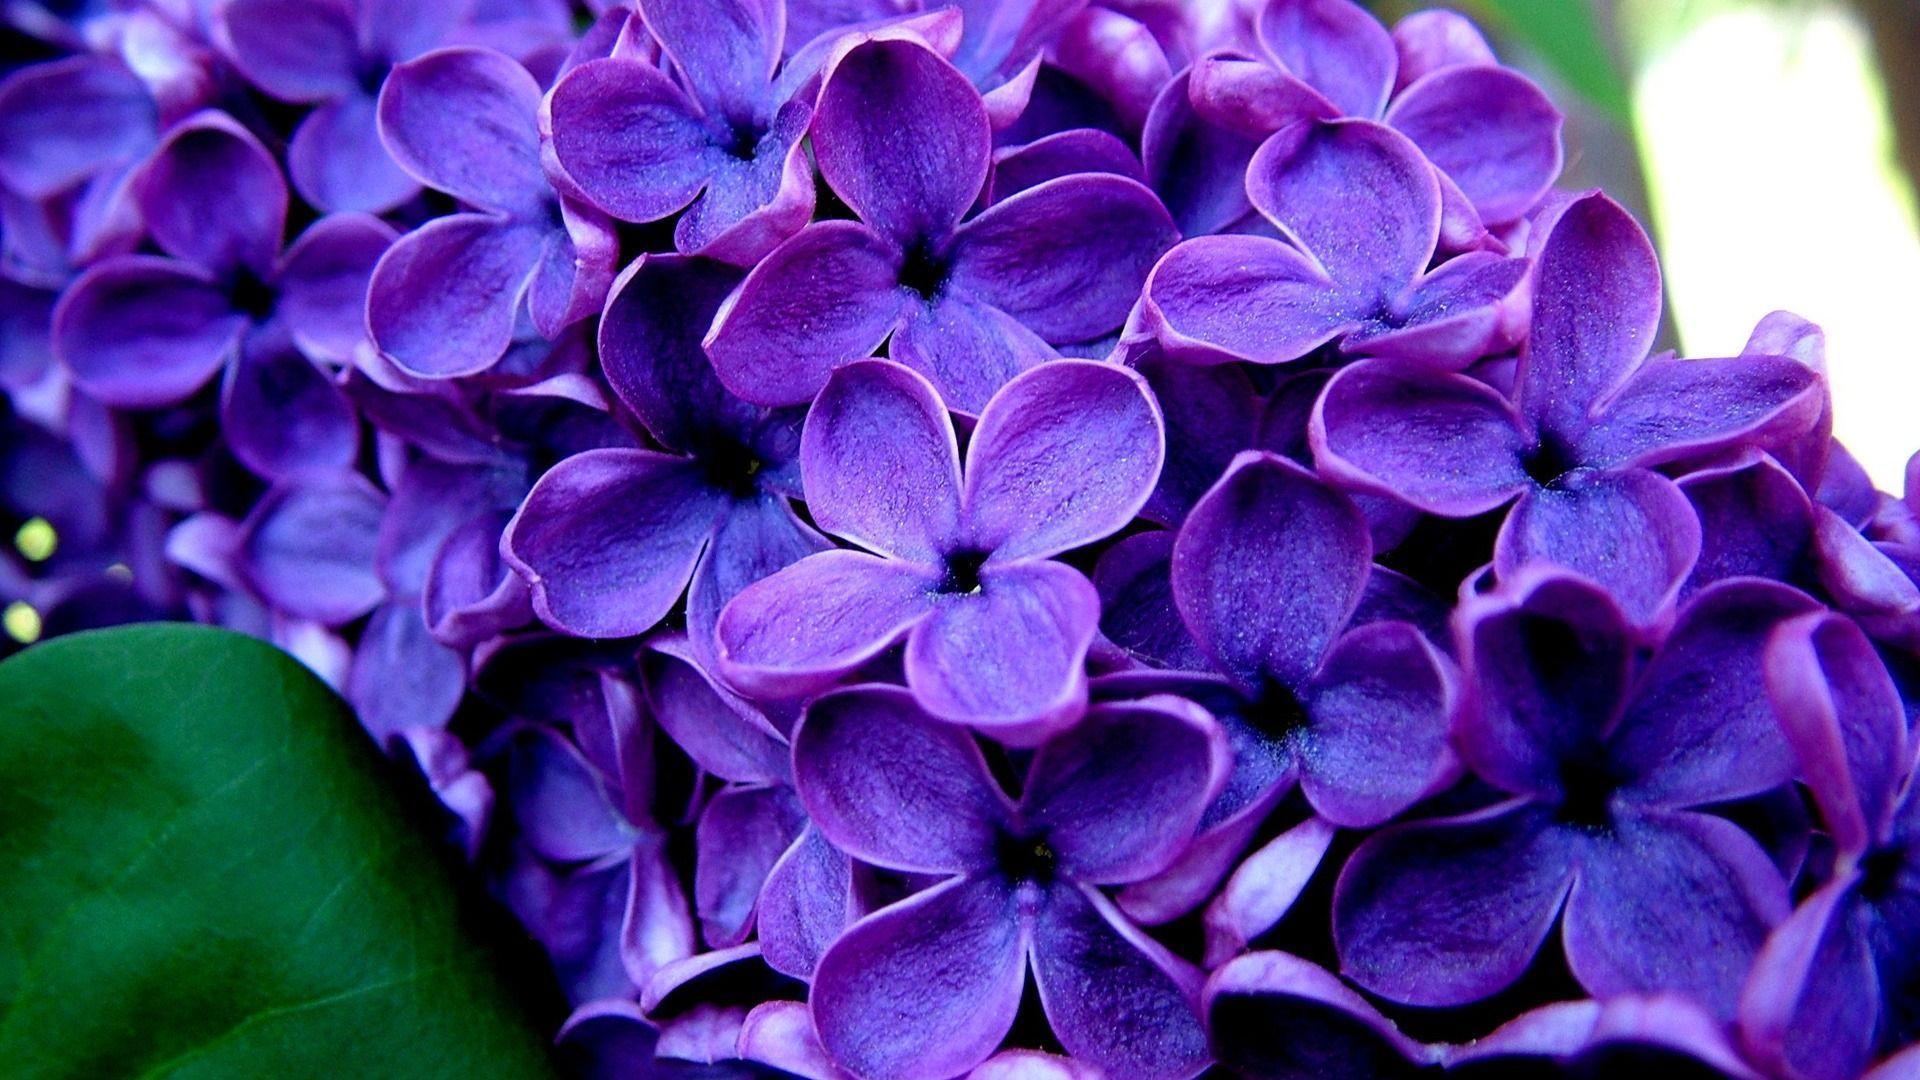 Purple Flowers Wallpapers - Wallpaper Cave